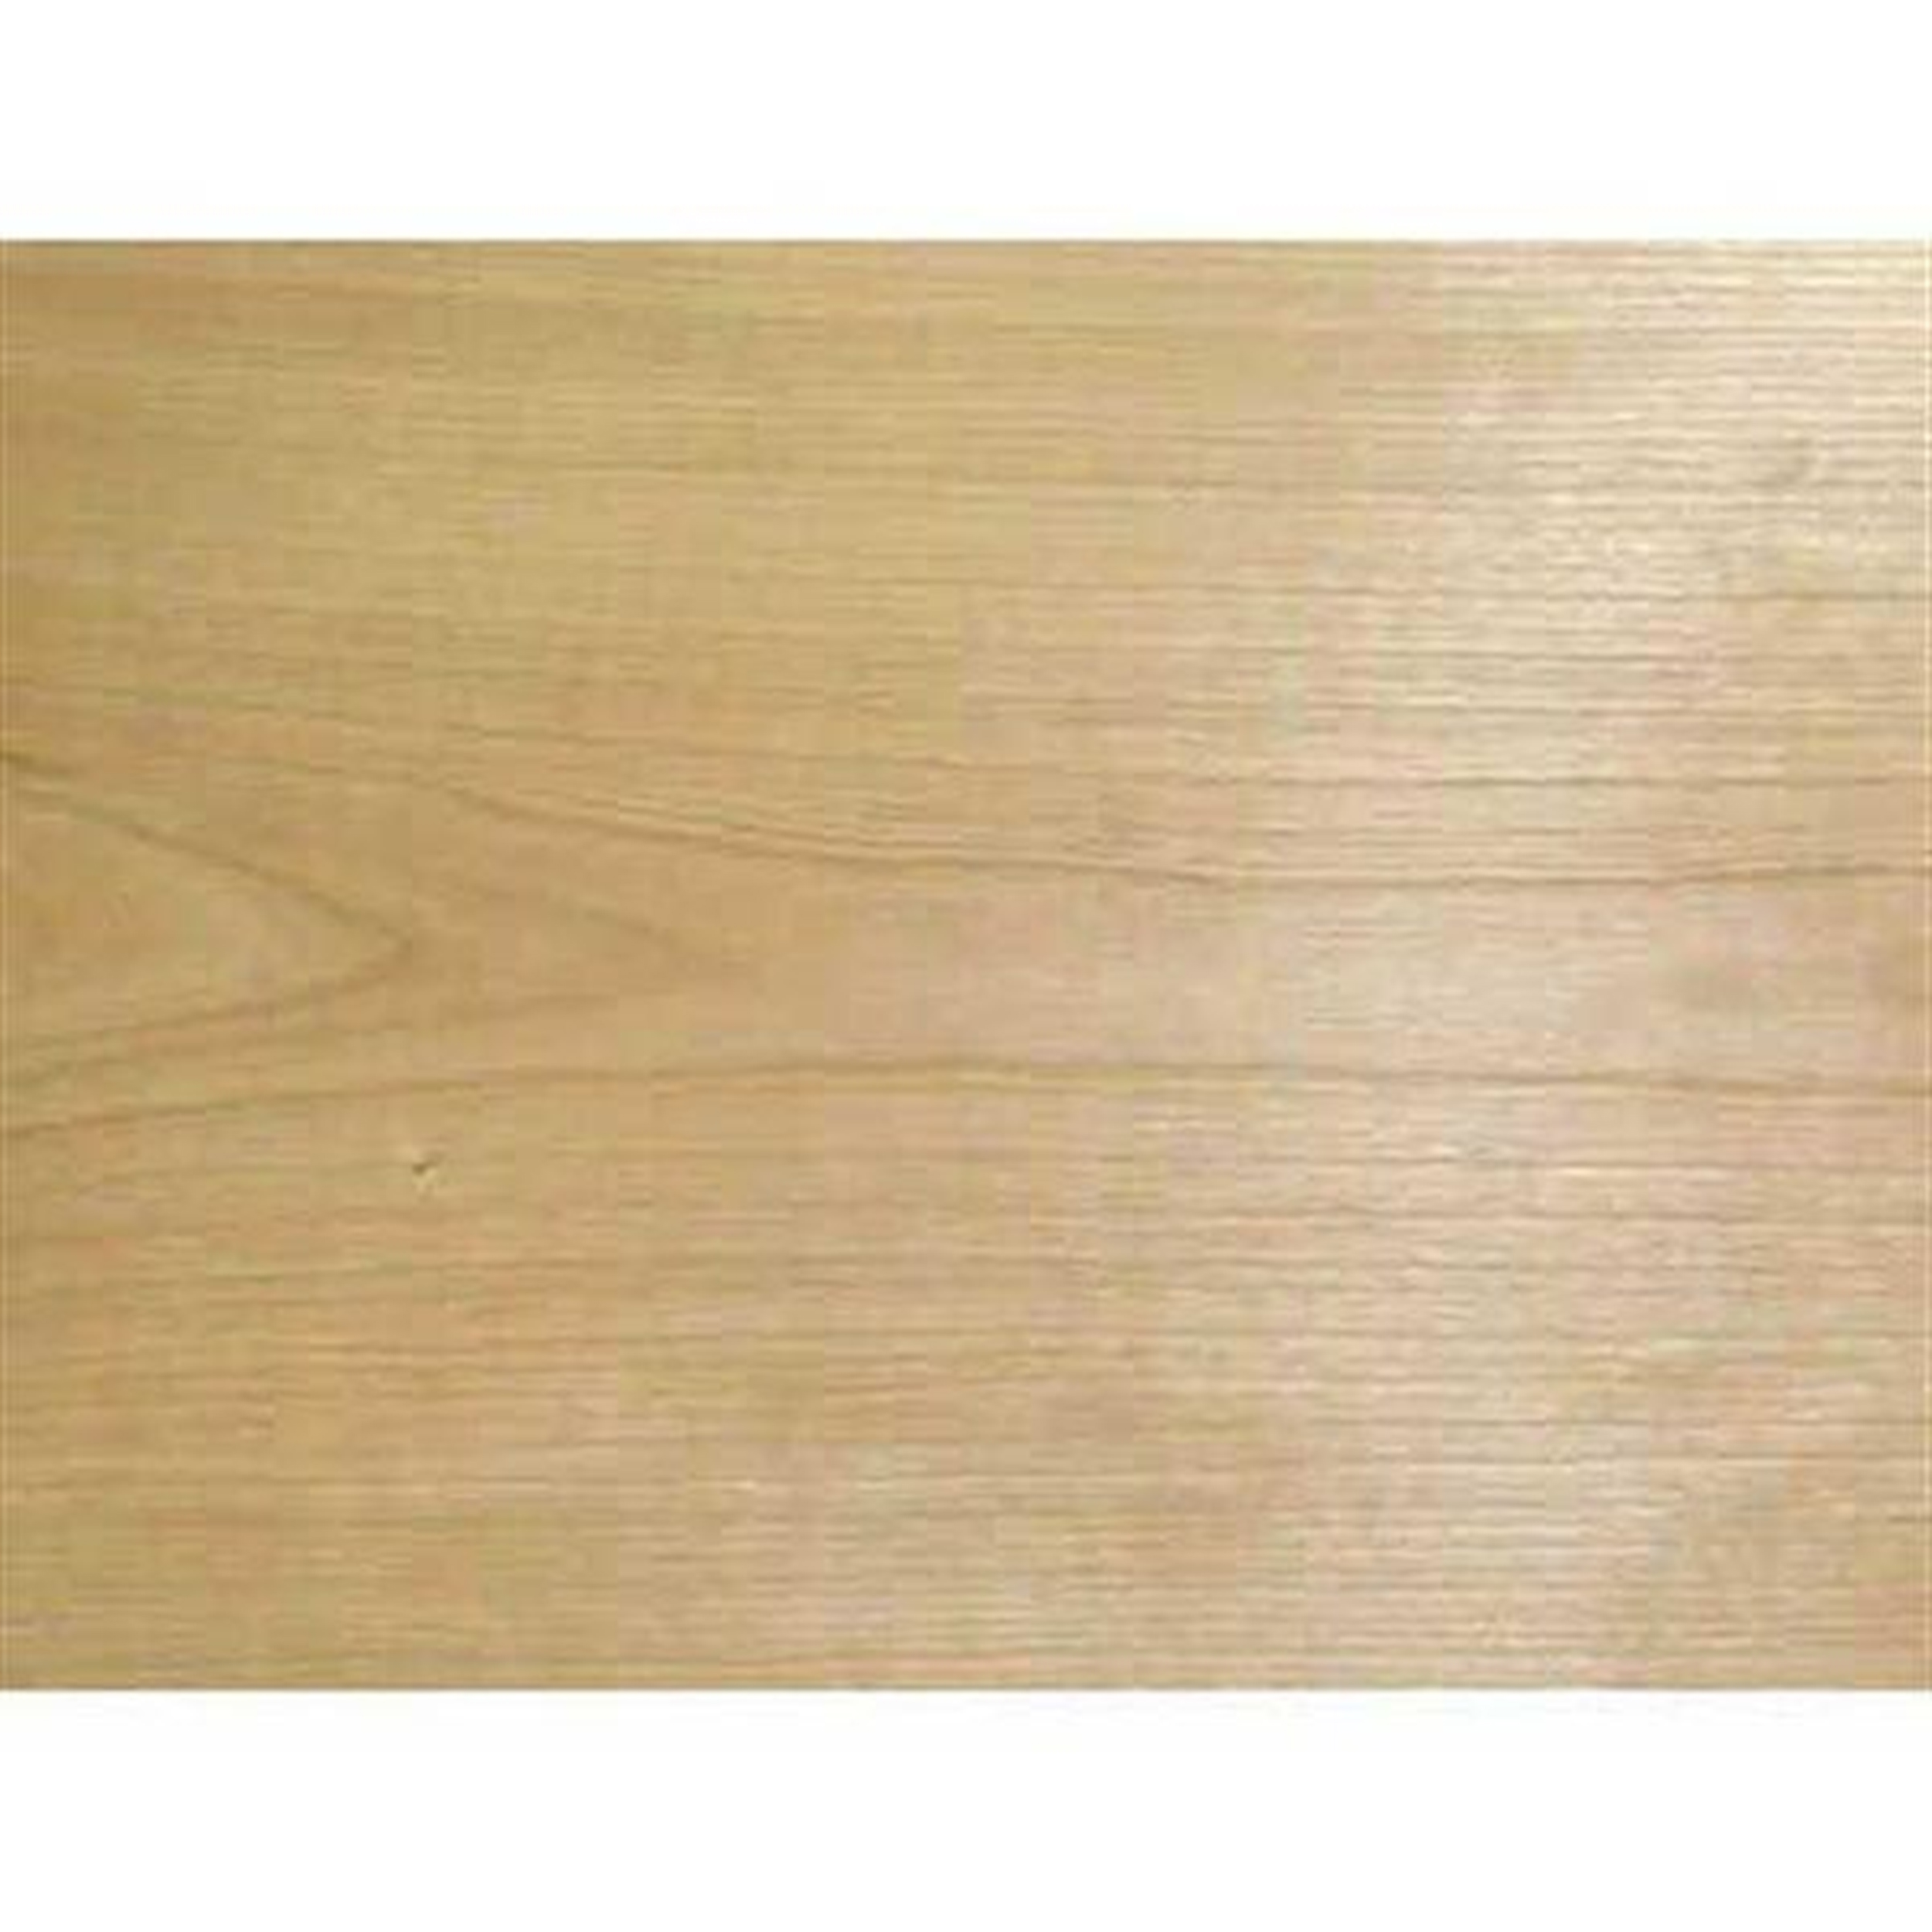 Cherry 2' x 8' 3M? PSA Backed Wood Veneer